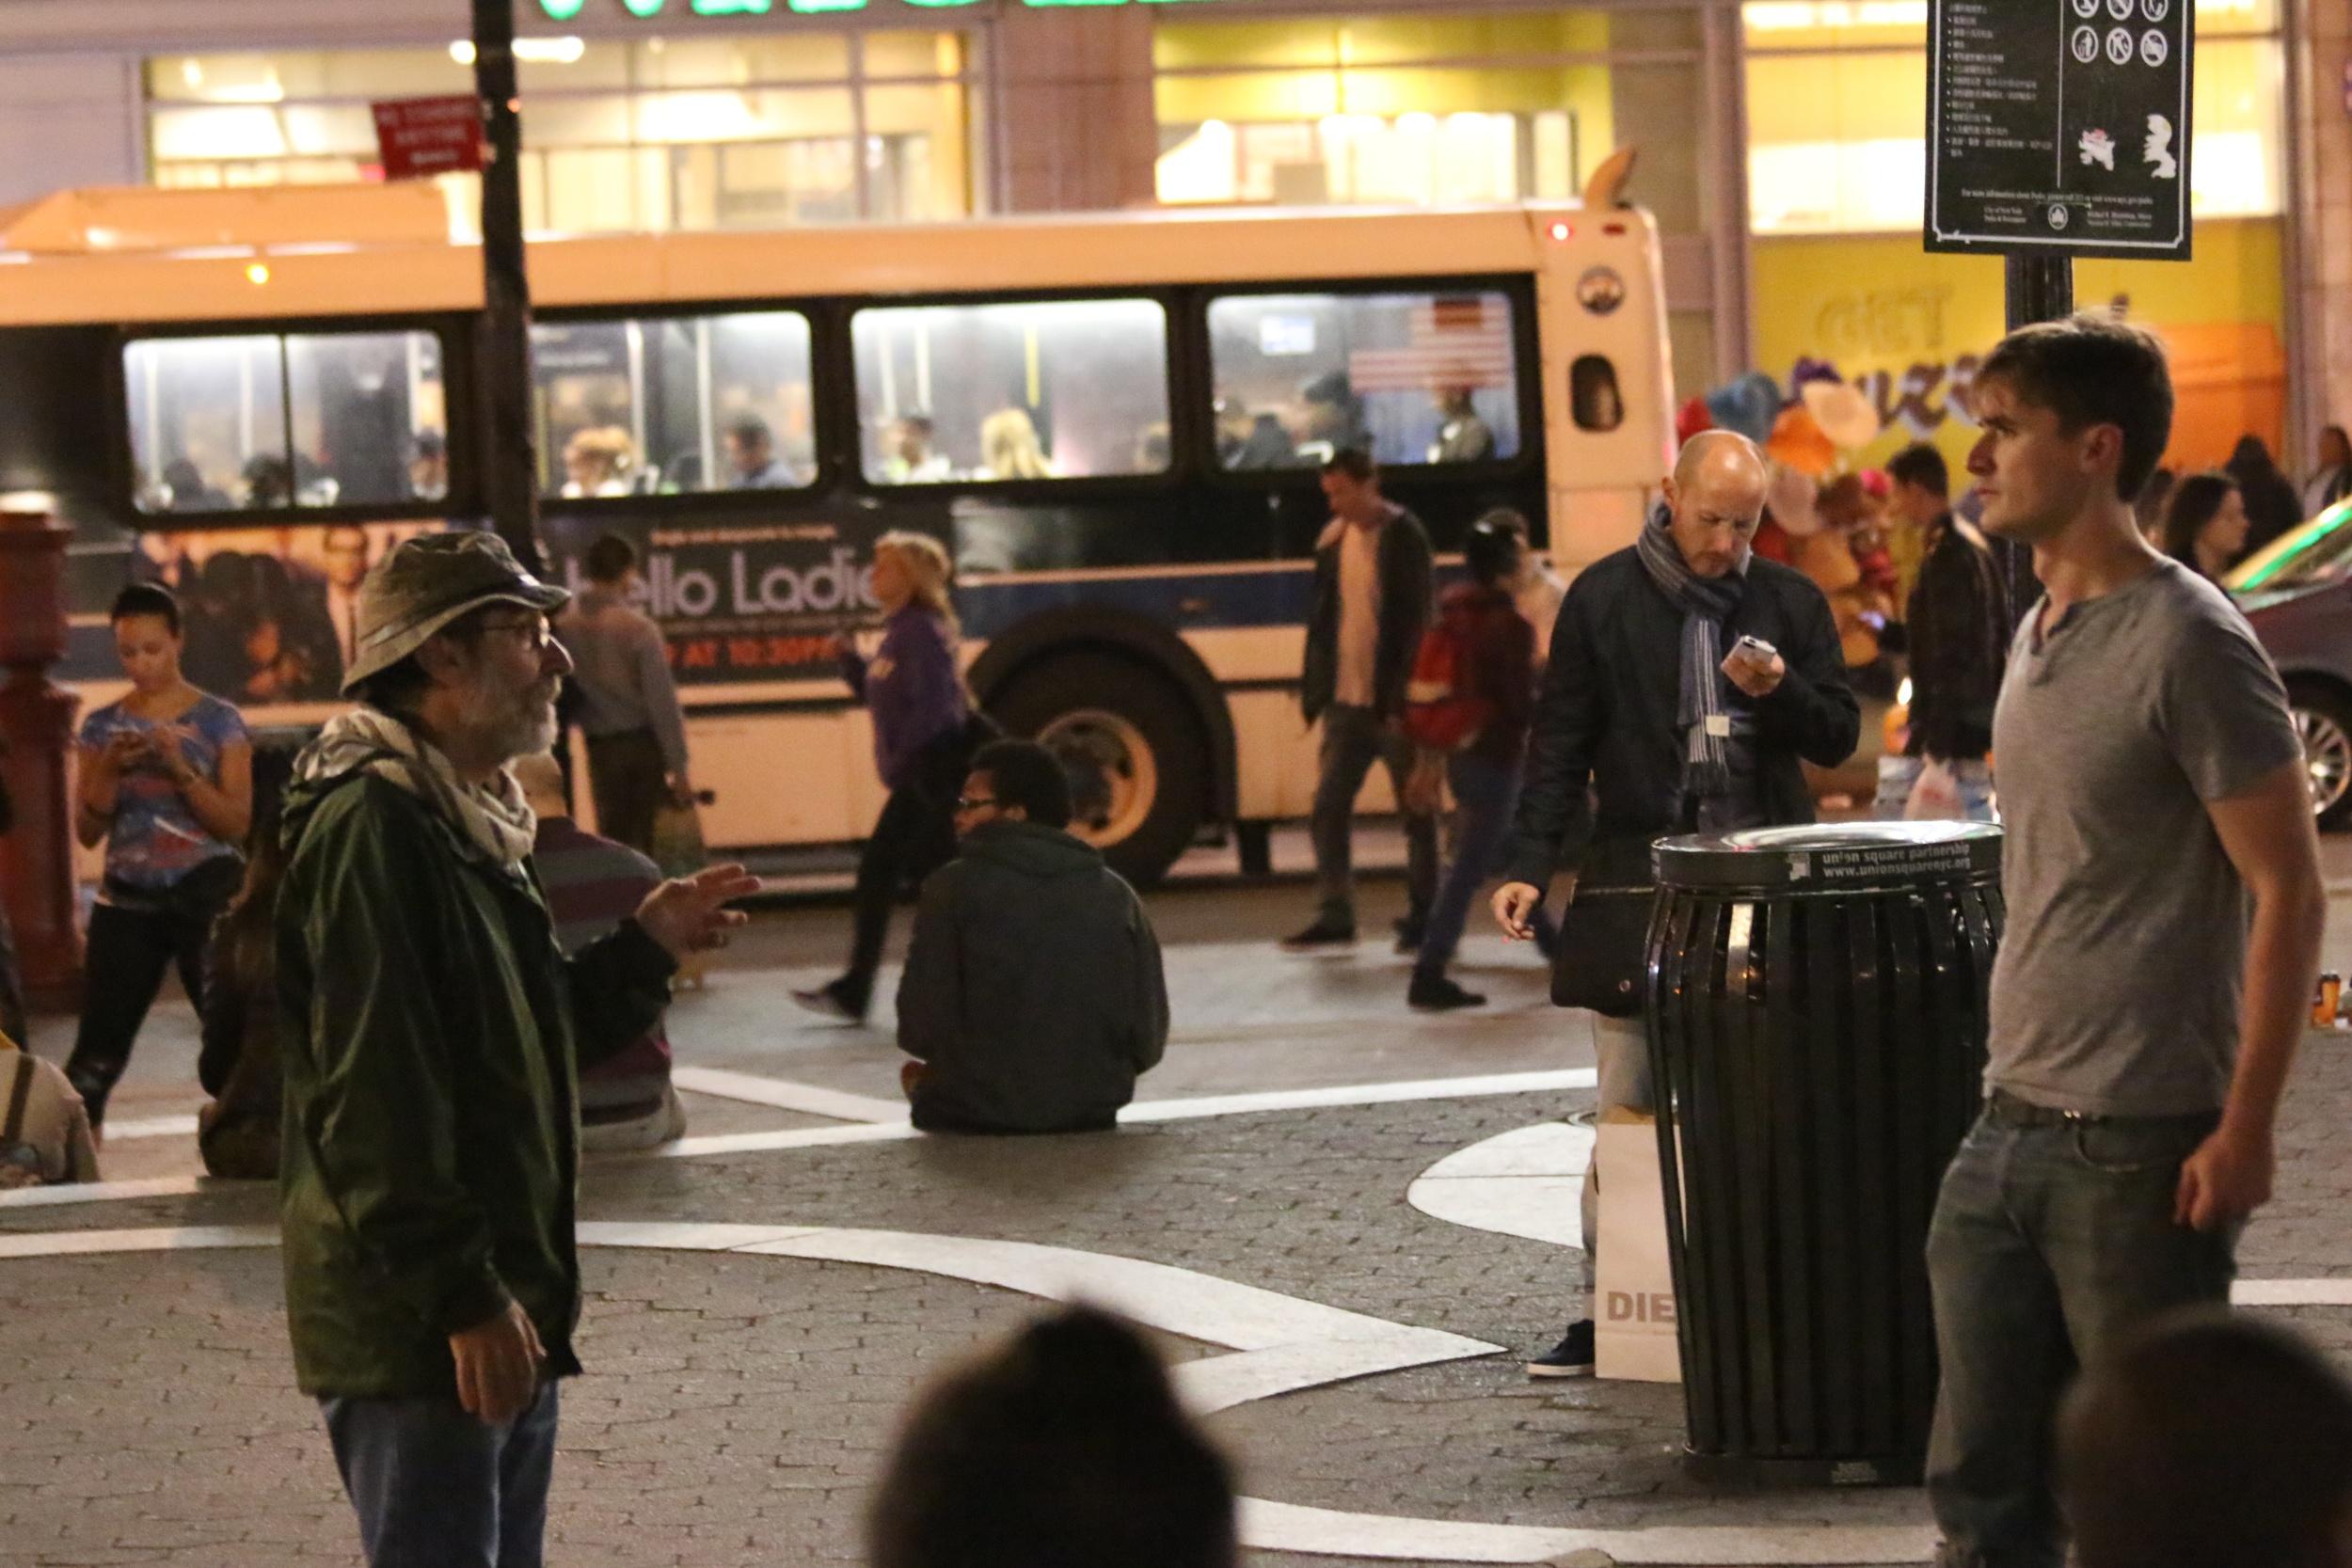 #Occupy Verona